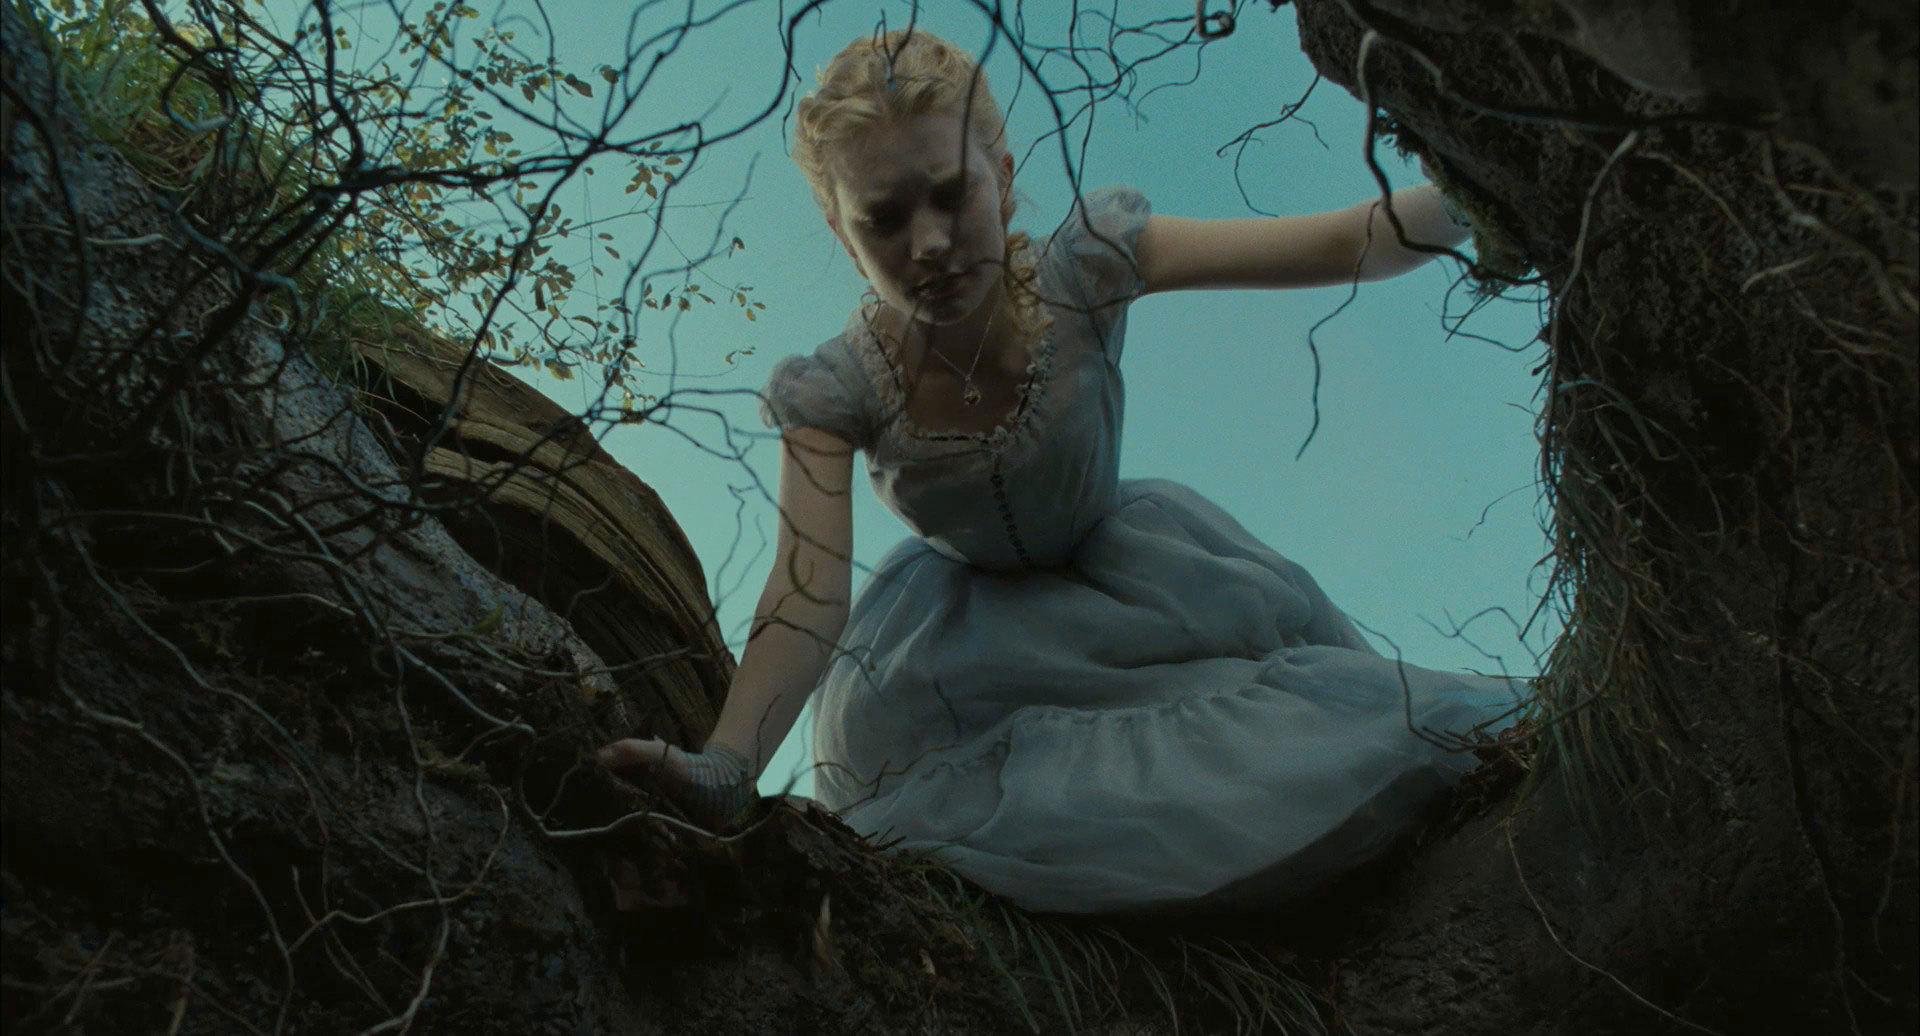 Falling Down The Rabbit Hole Wallpaper Alice In Wonderland 2010 Images Alice In Wonderland Hd